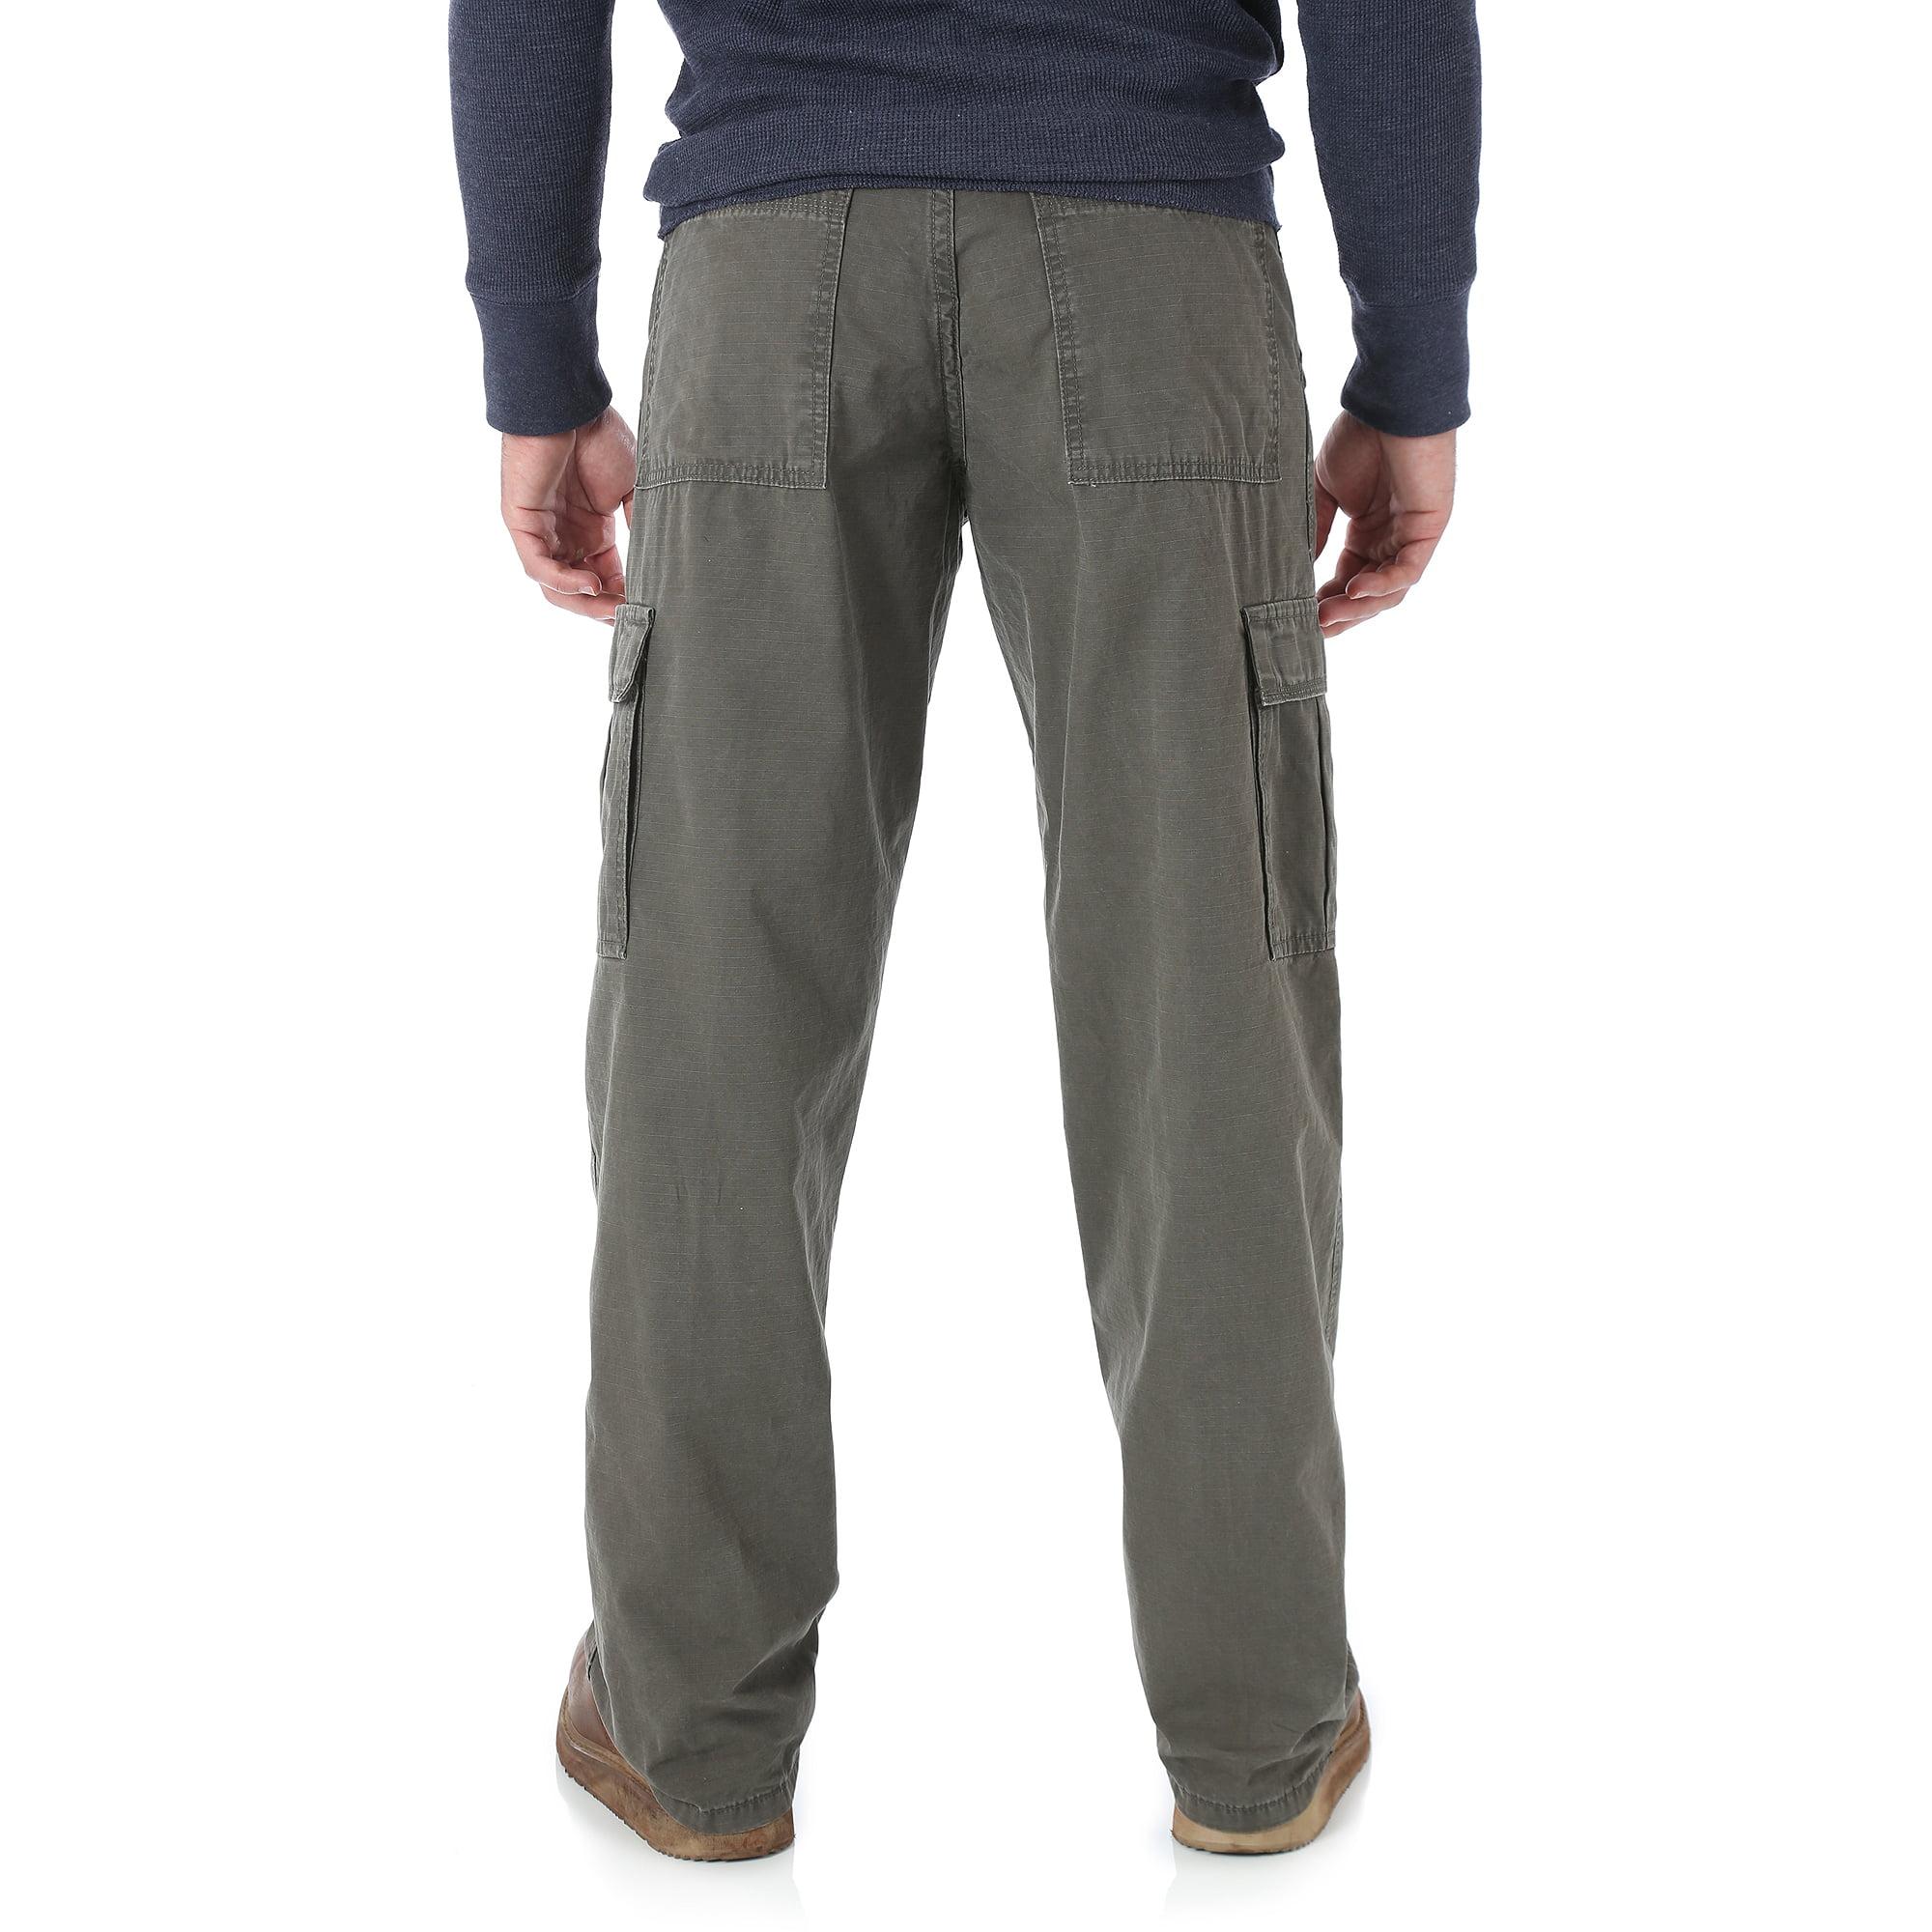 Wrangler - Big Men's Rip-Stop Cargo Pants - Walmart.com